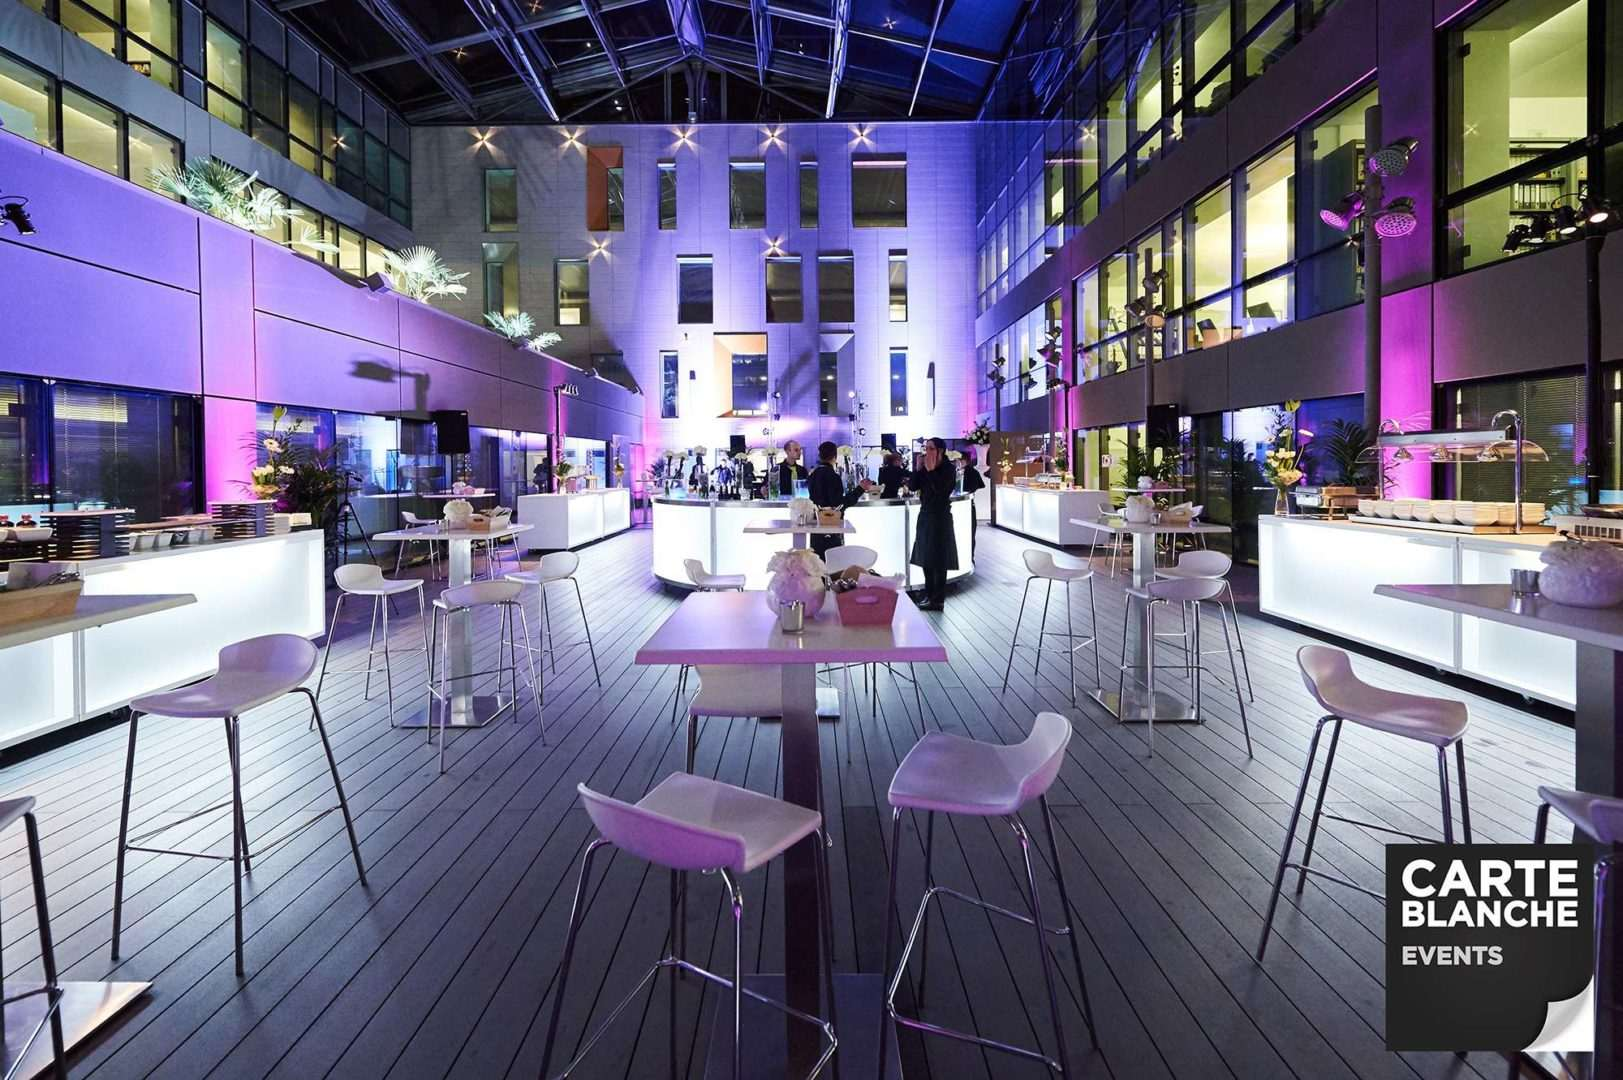 xmas-degroof-petercam-2015-029-luxembourg-event